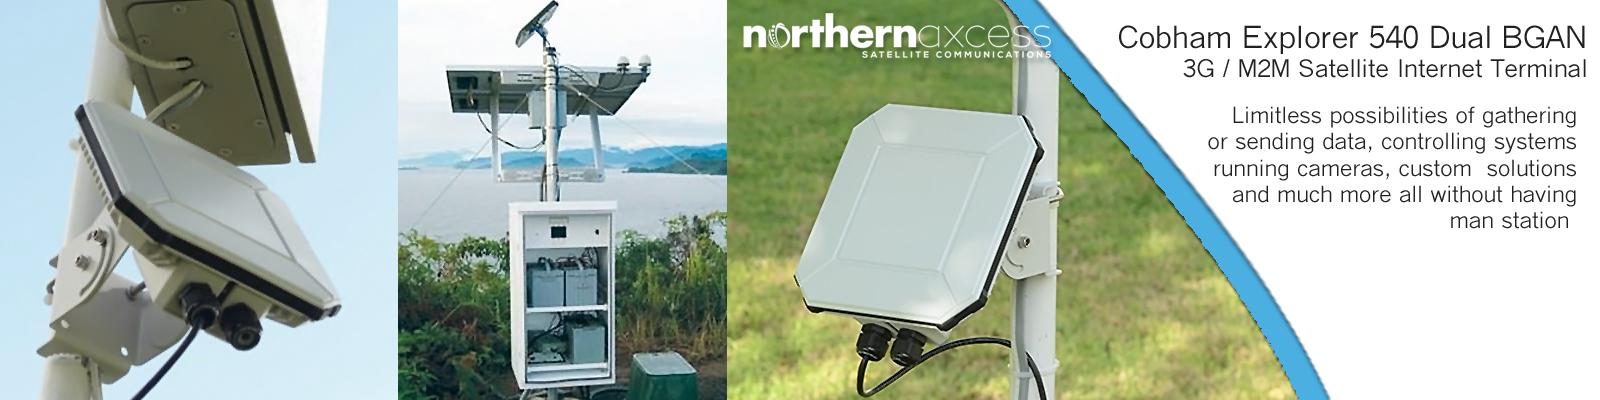 cobham-explorer-540-dual-bgan-m2m-satellite-terminal-banner-northernaxcess.jpg